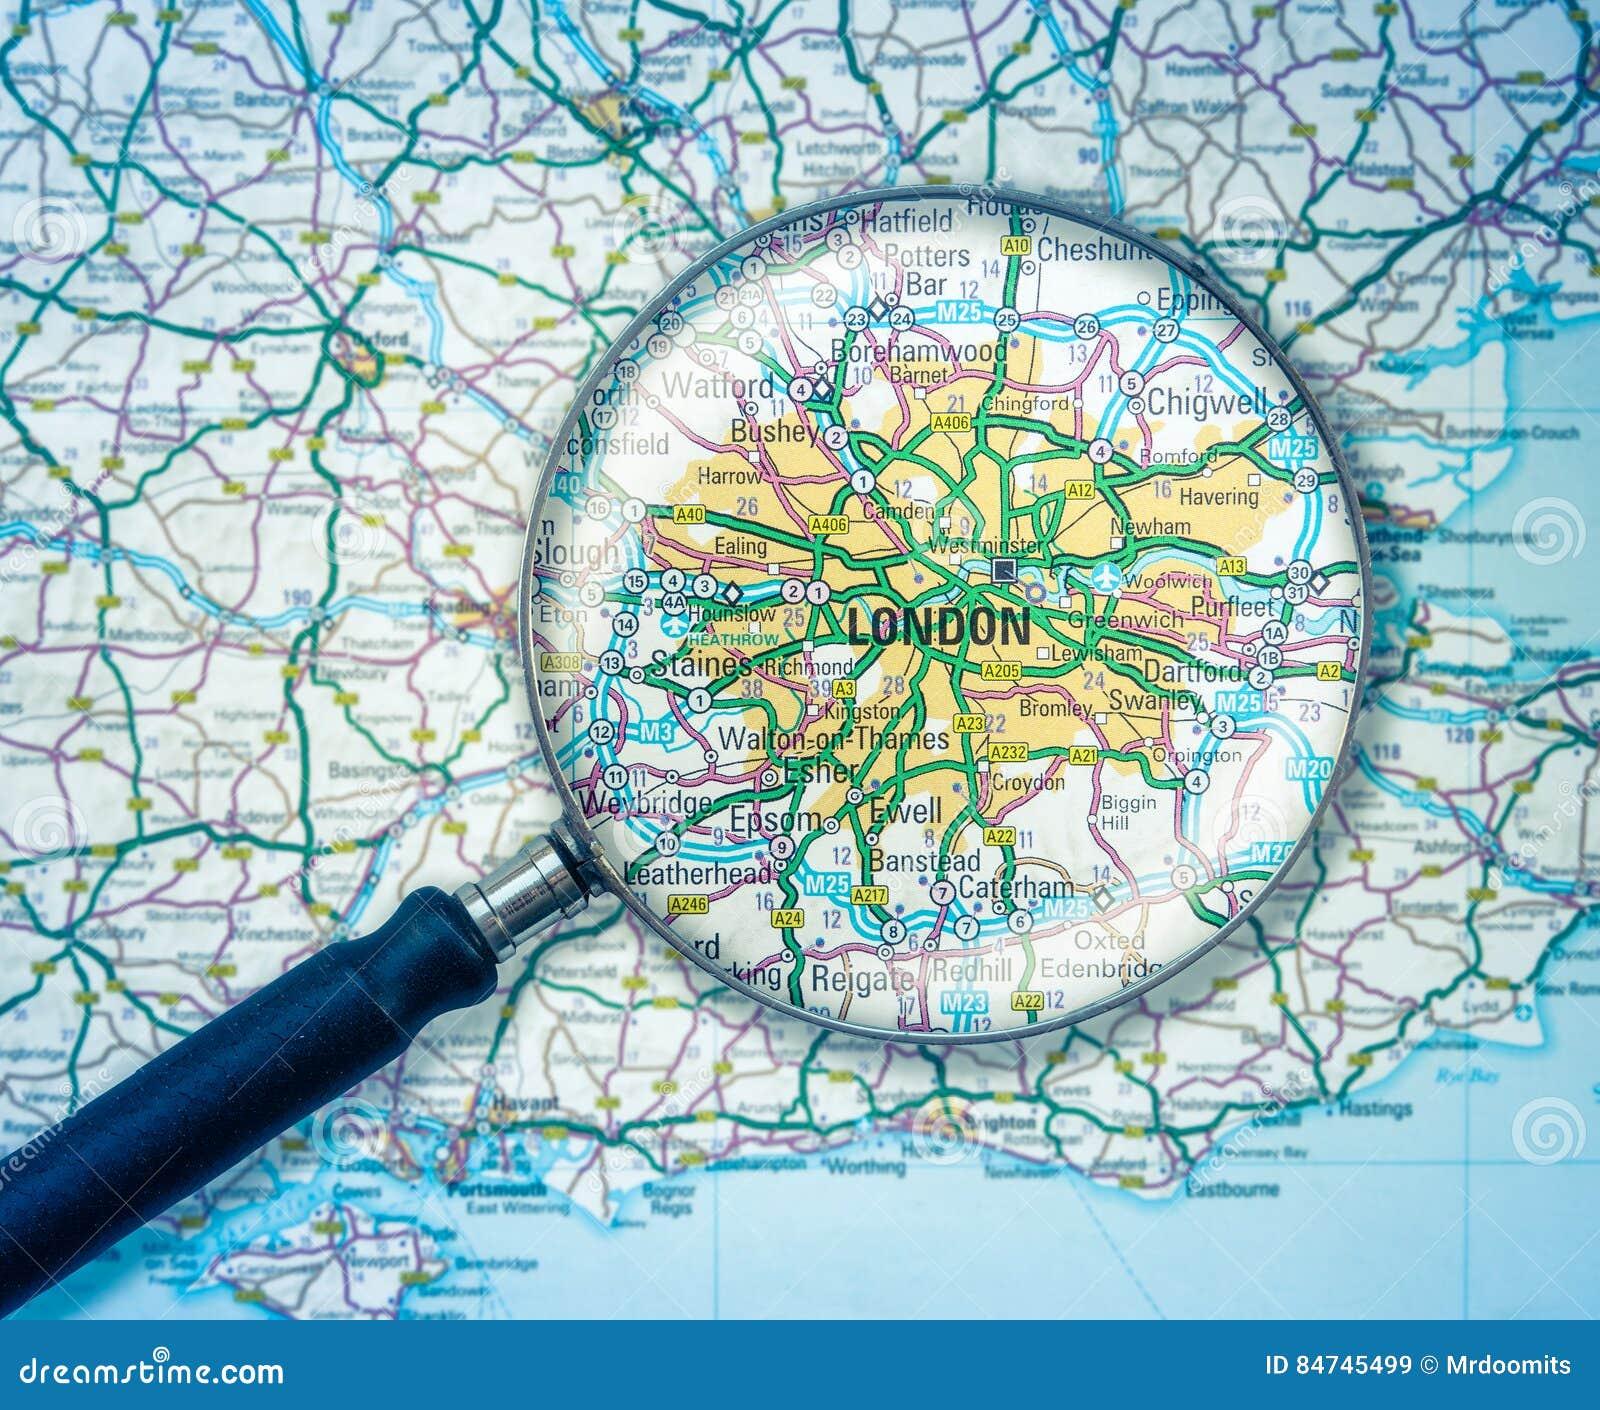 Karte London.London Karte Mit Lupe Stockbild Bild Von Atlas Kompliziert 84745499